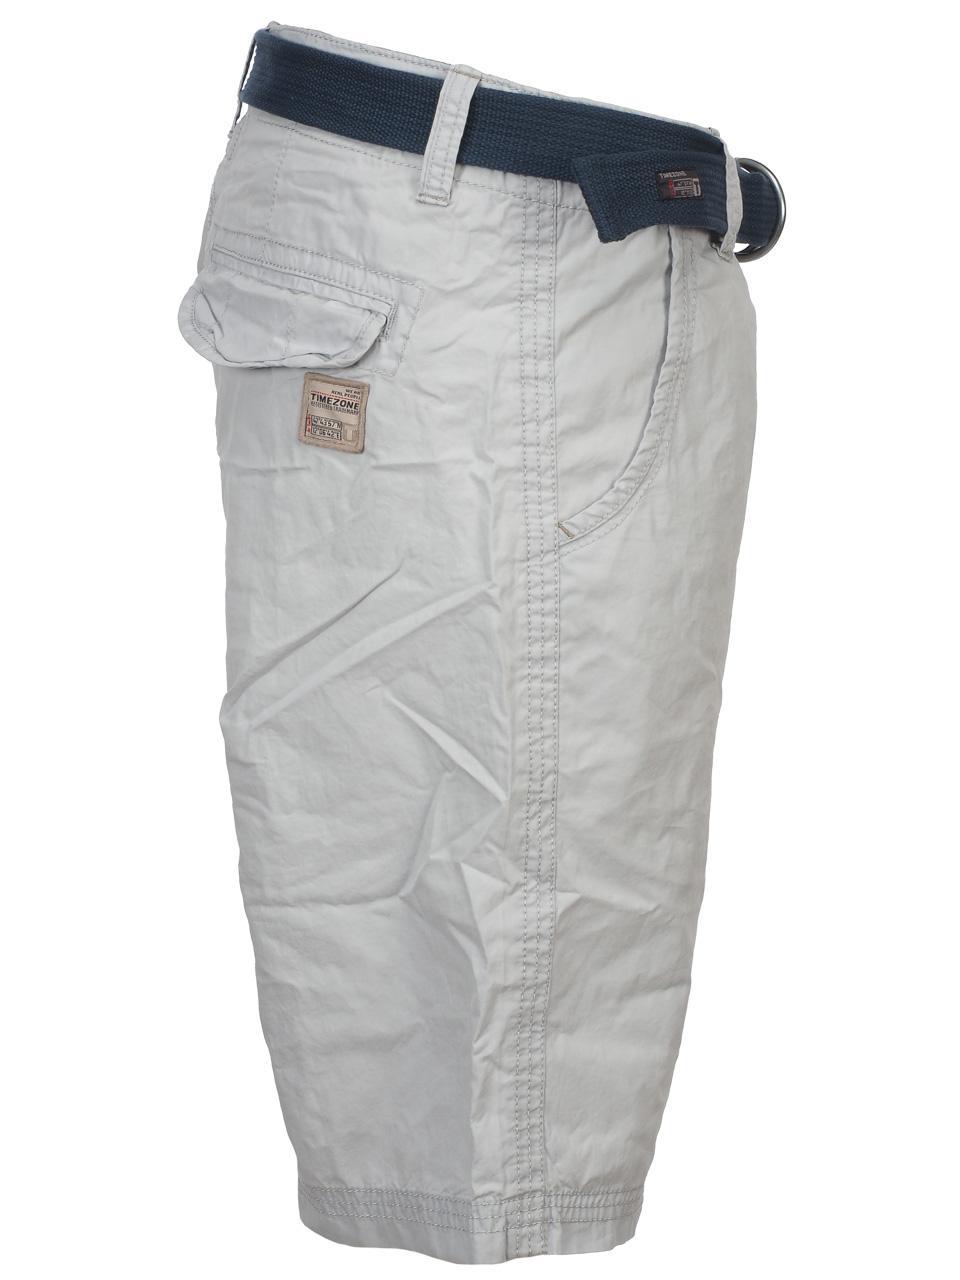 Bermuda-Shorts-Timezone-Russell-Light-Grey-Shorts-Grey-42181-New thumbnail 2